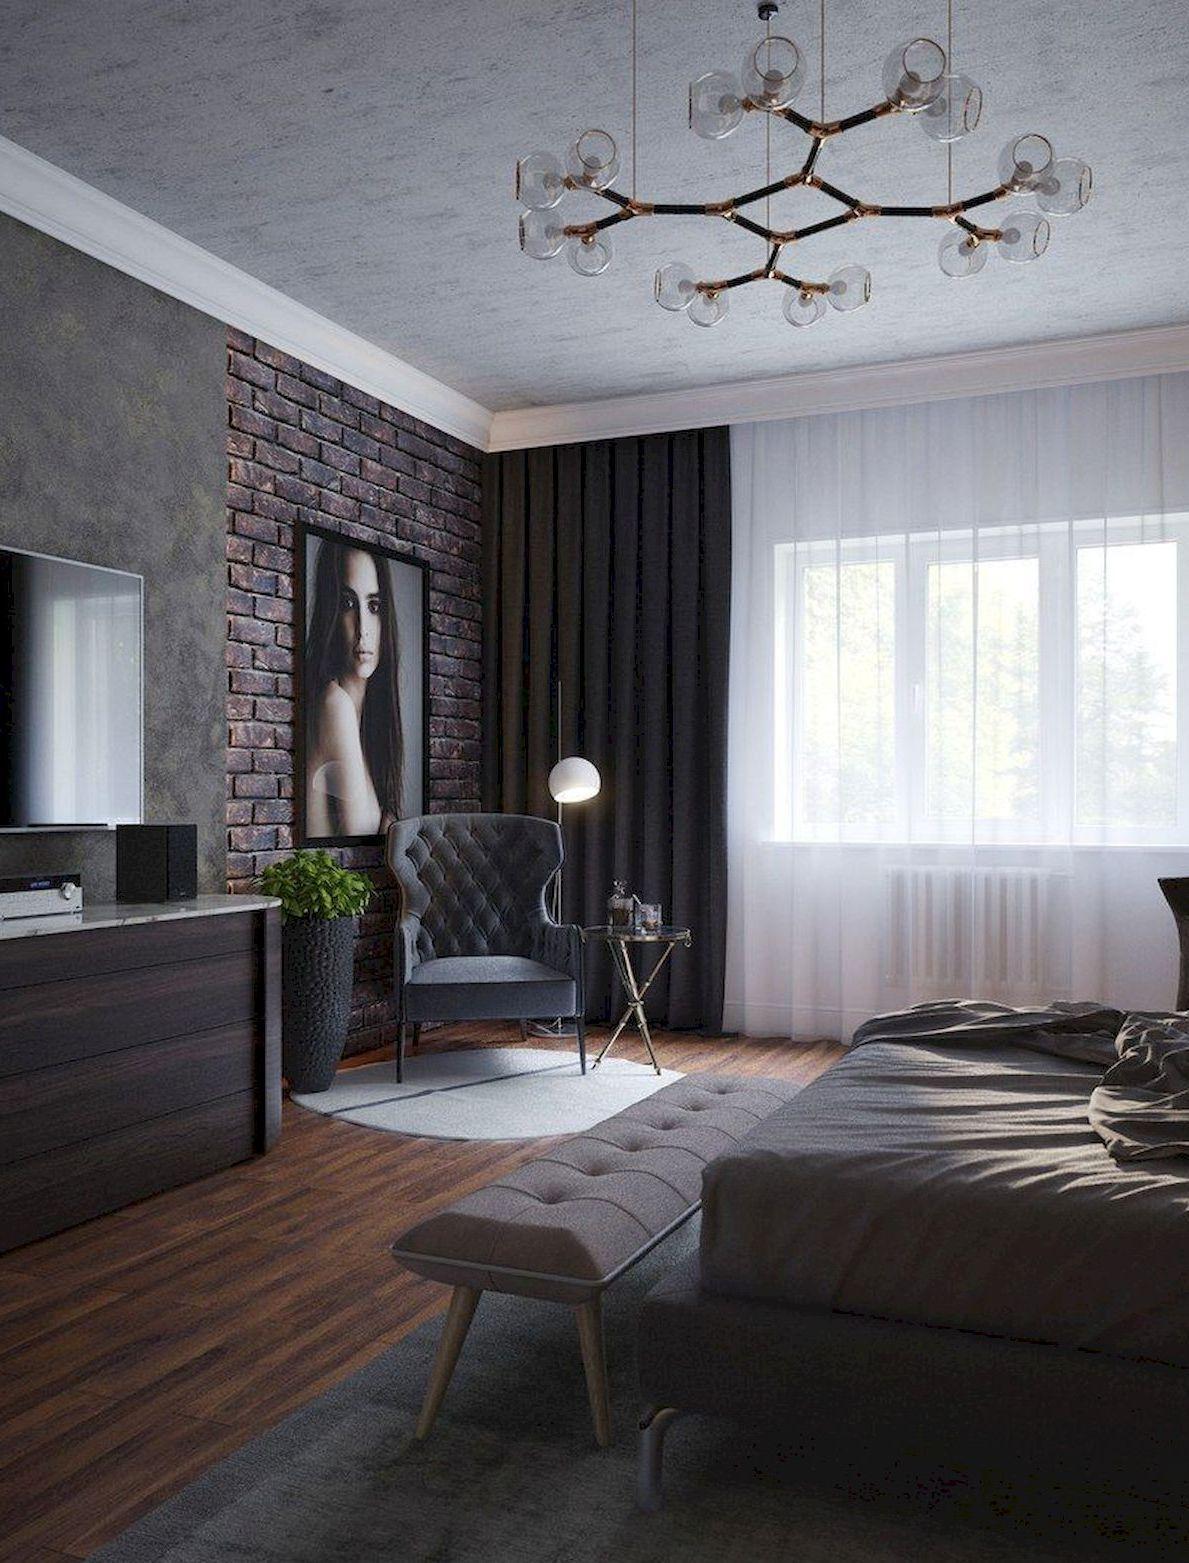 Tijolos loft interiors pinterest kitchen design house and interior also rh